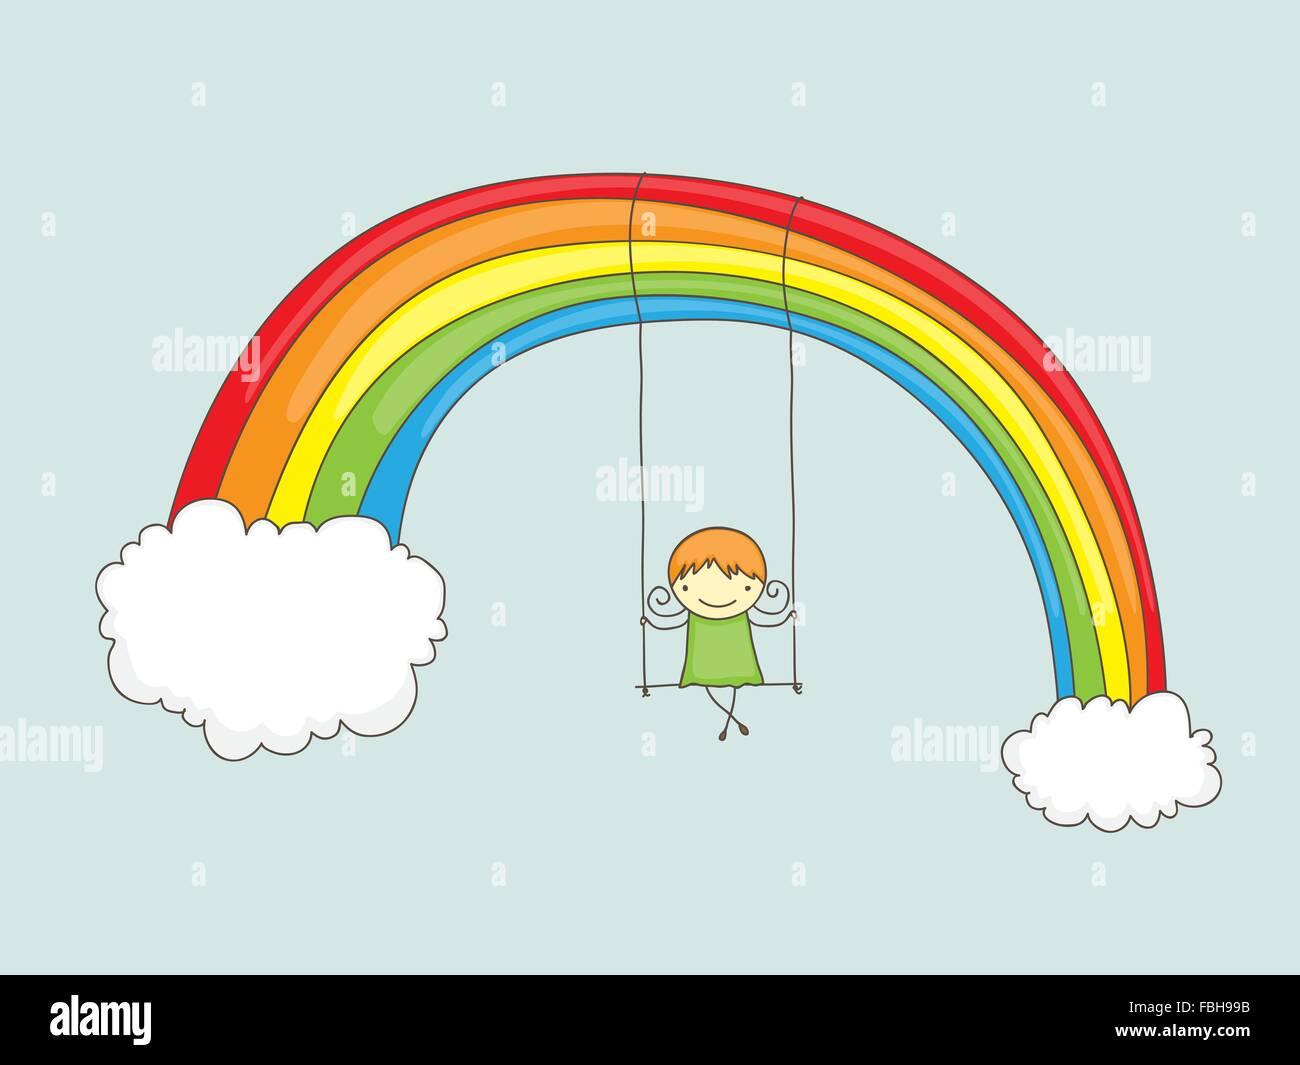 Cartoon girl swinging on a rainbow - Stock Vector